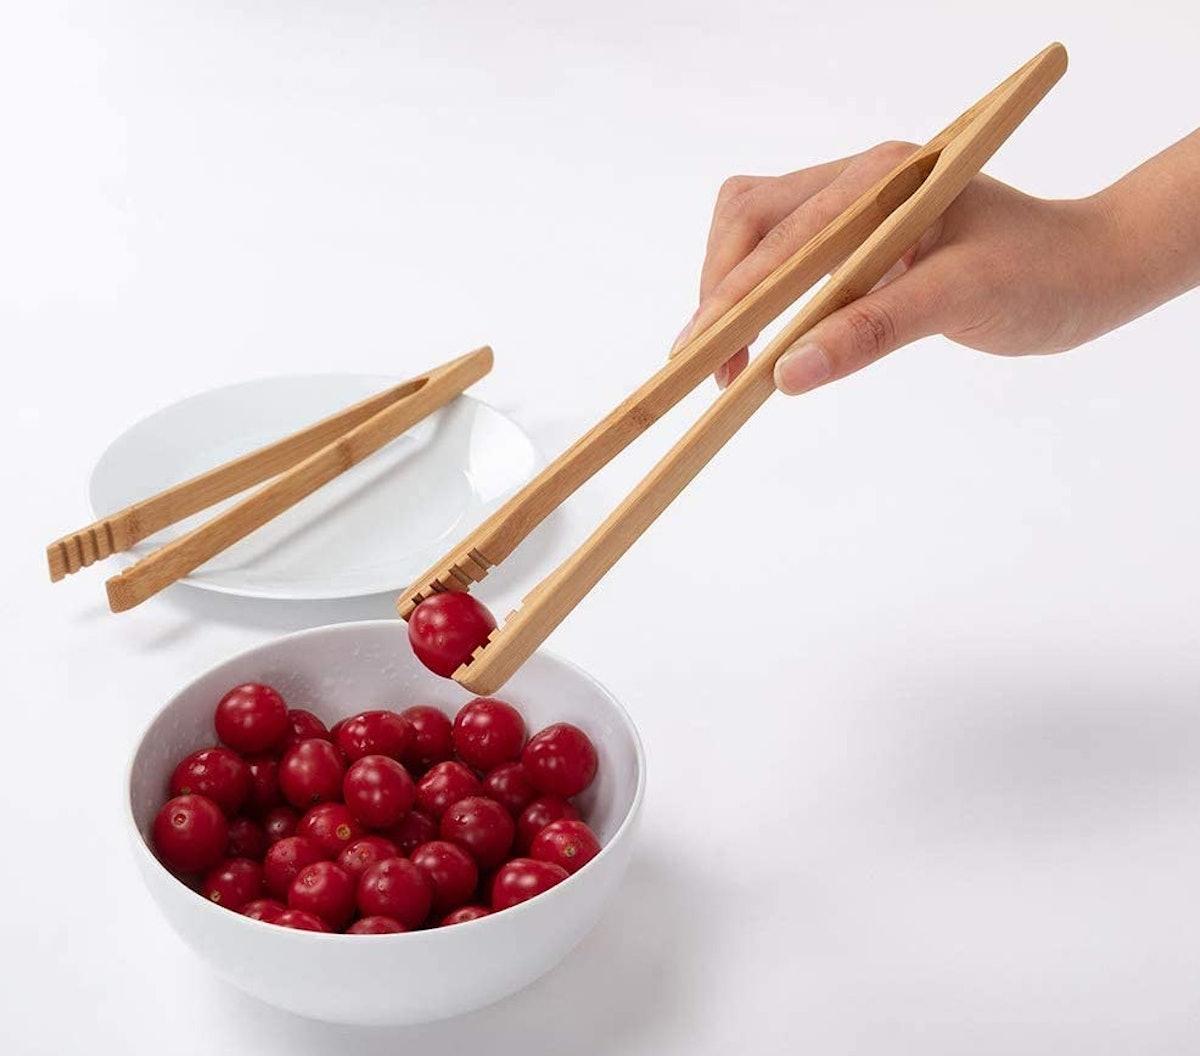 DUJEN Bamboo Tongs (2-Pack)